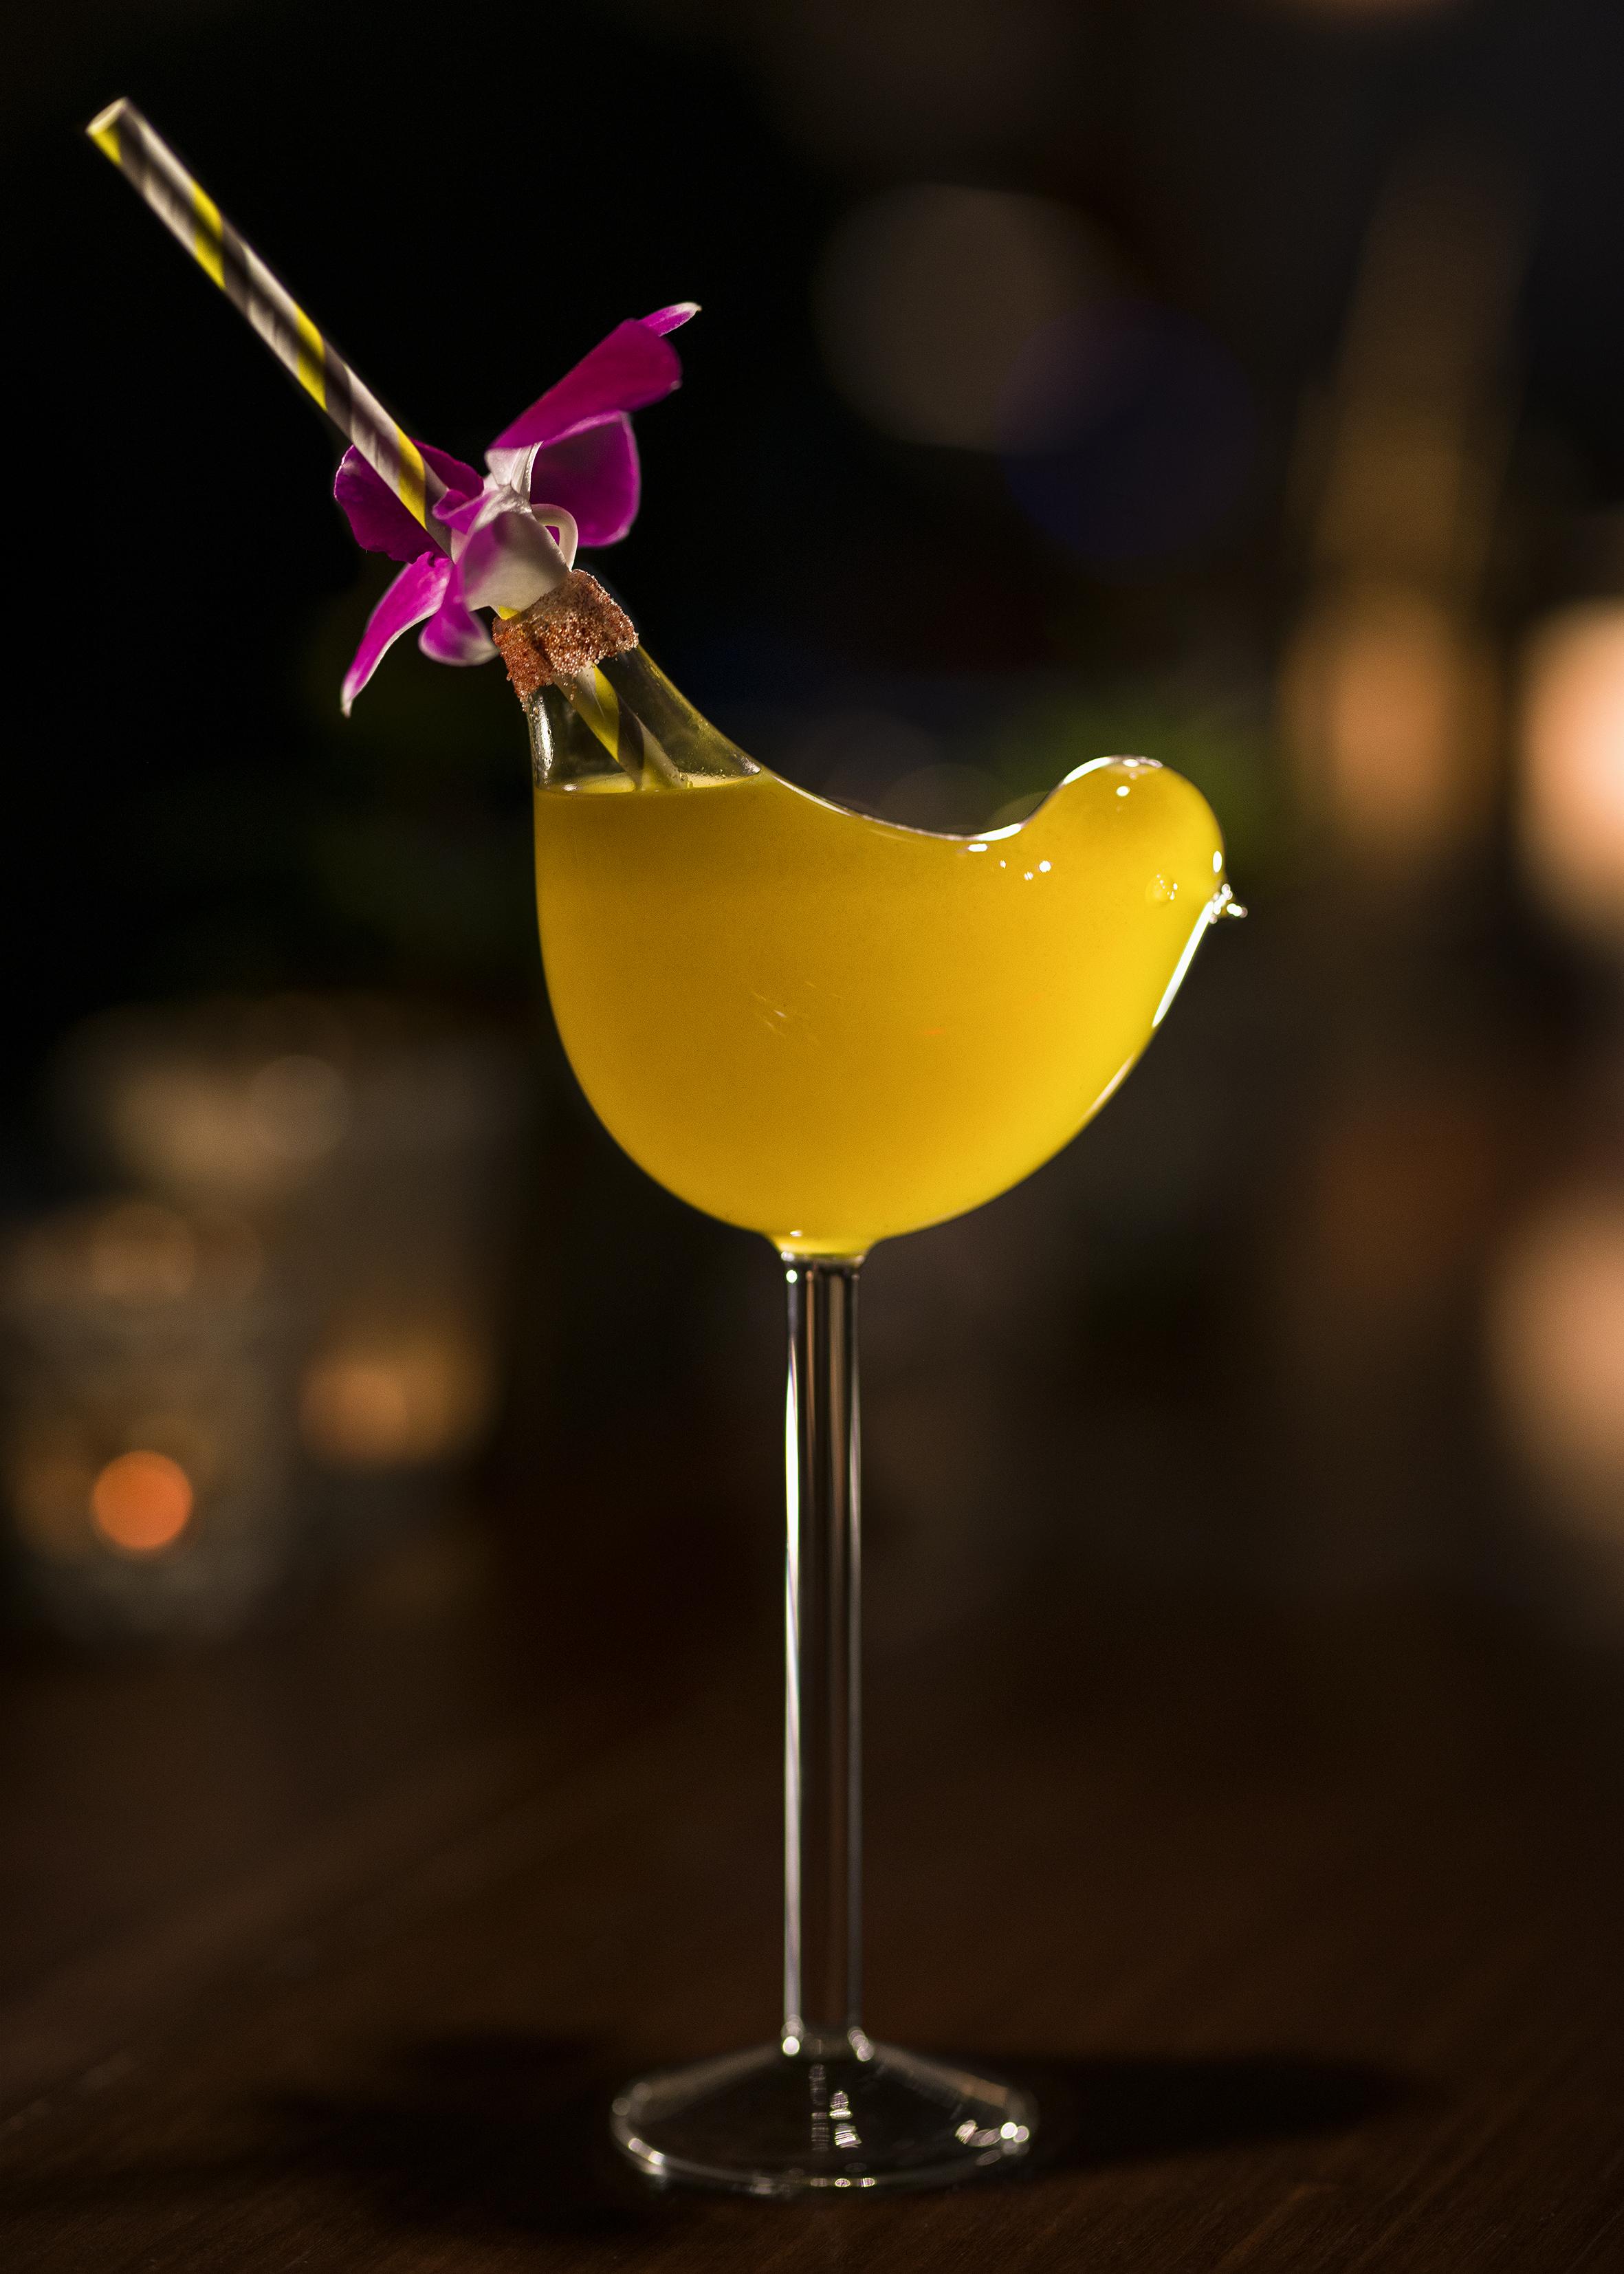 Betula_Cocktails_180419_034_HD_RomeoBalancourt.jpg